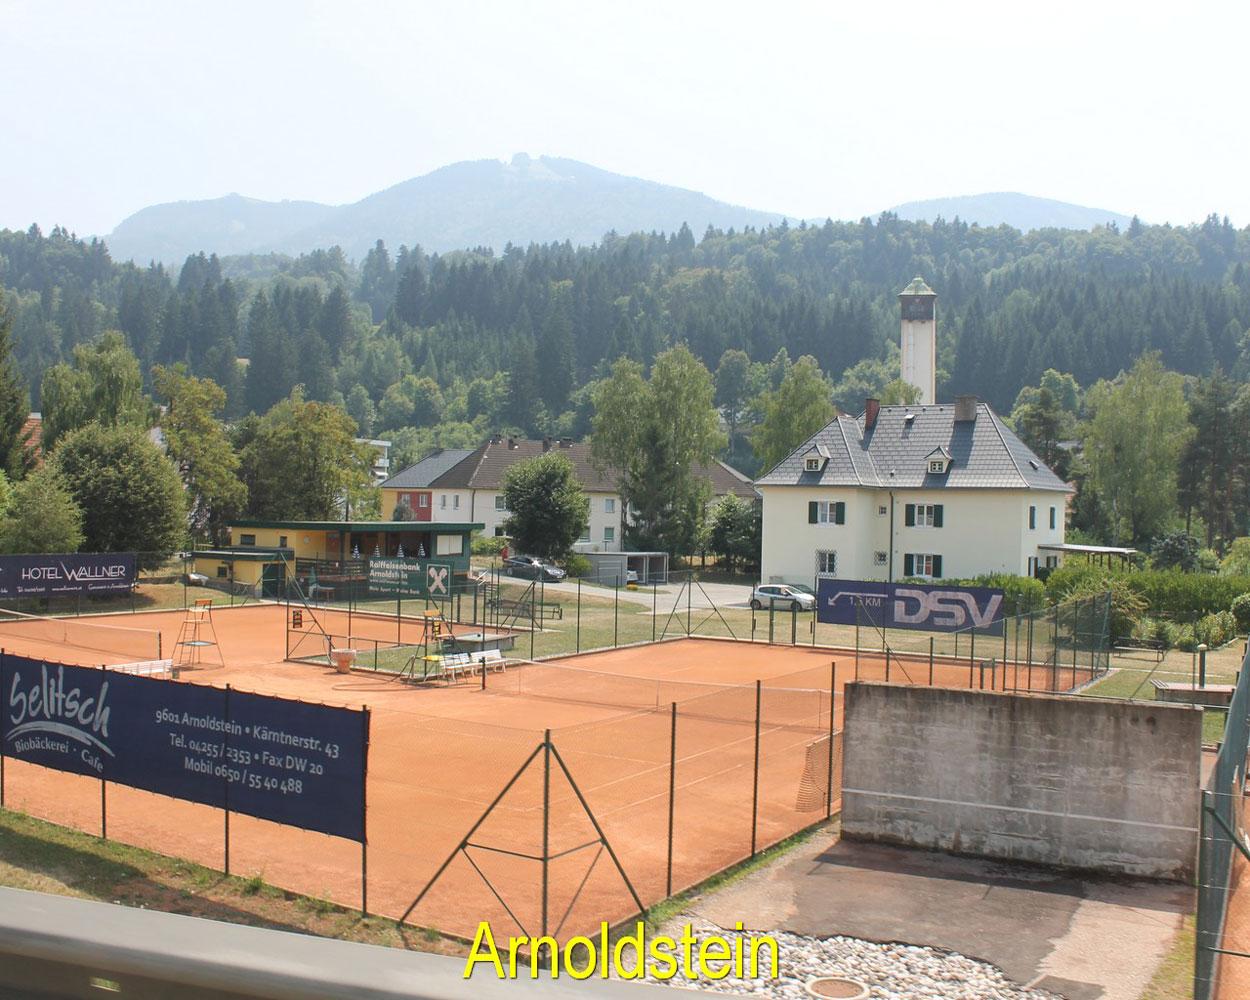 tennis-arnoldstein-berghaus-christel